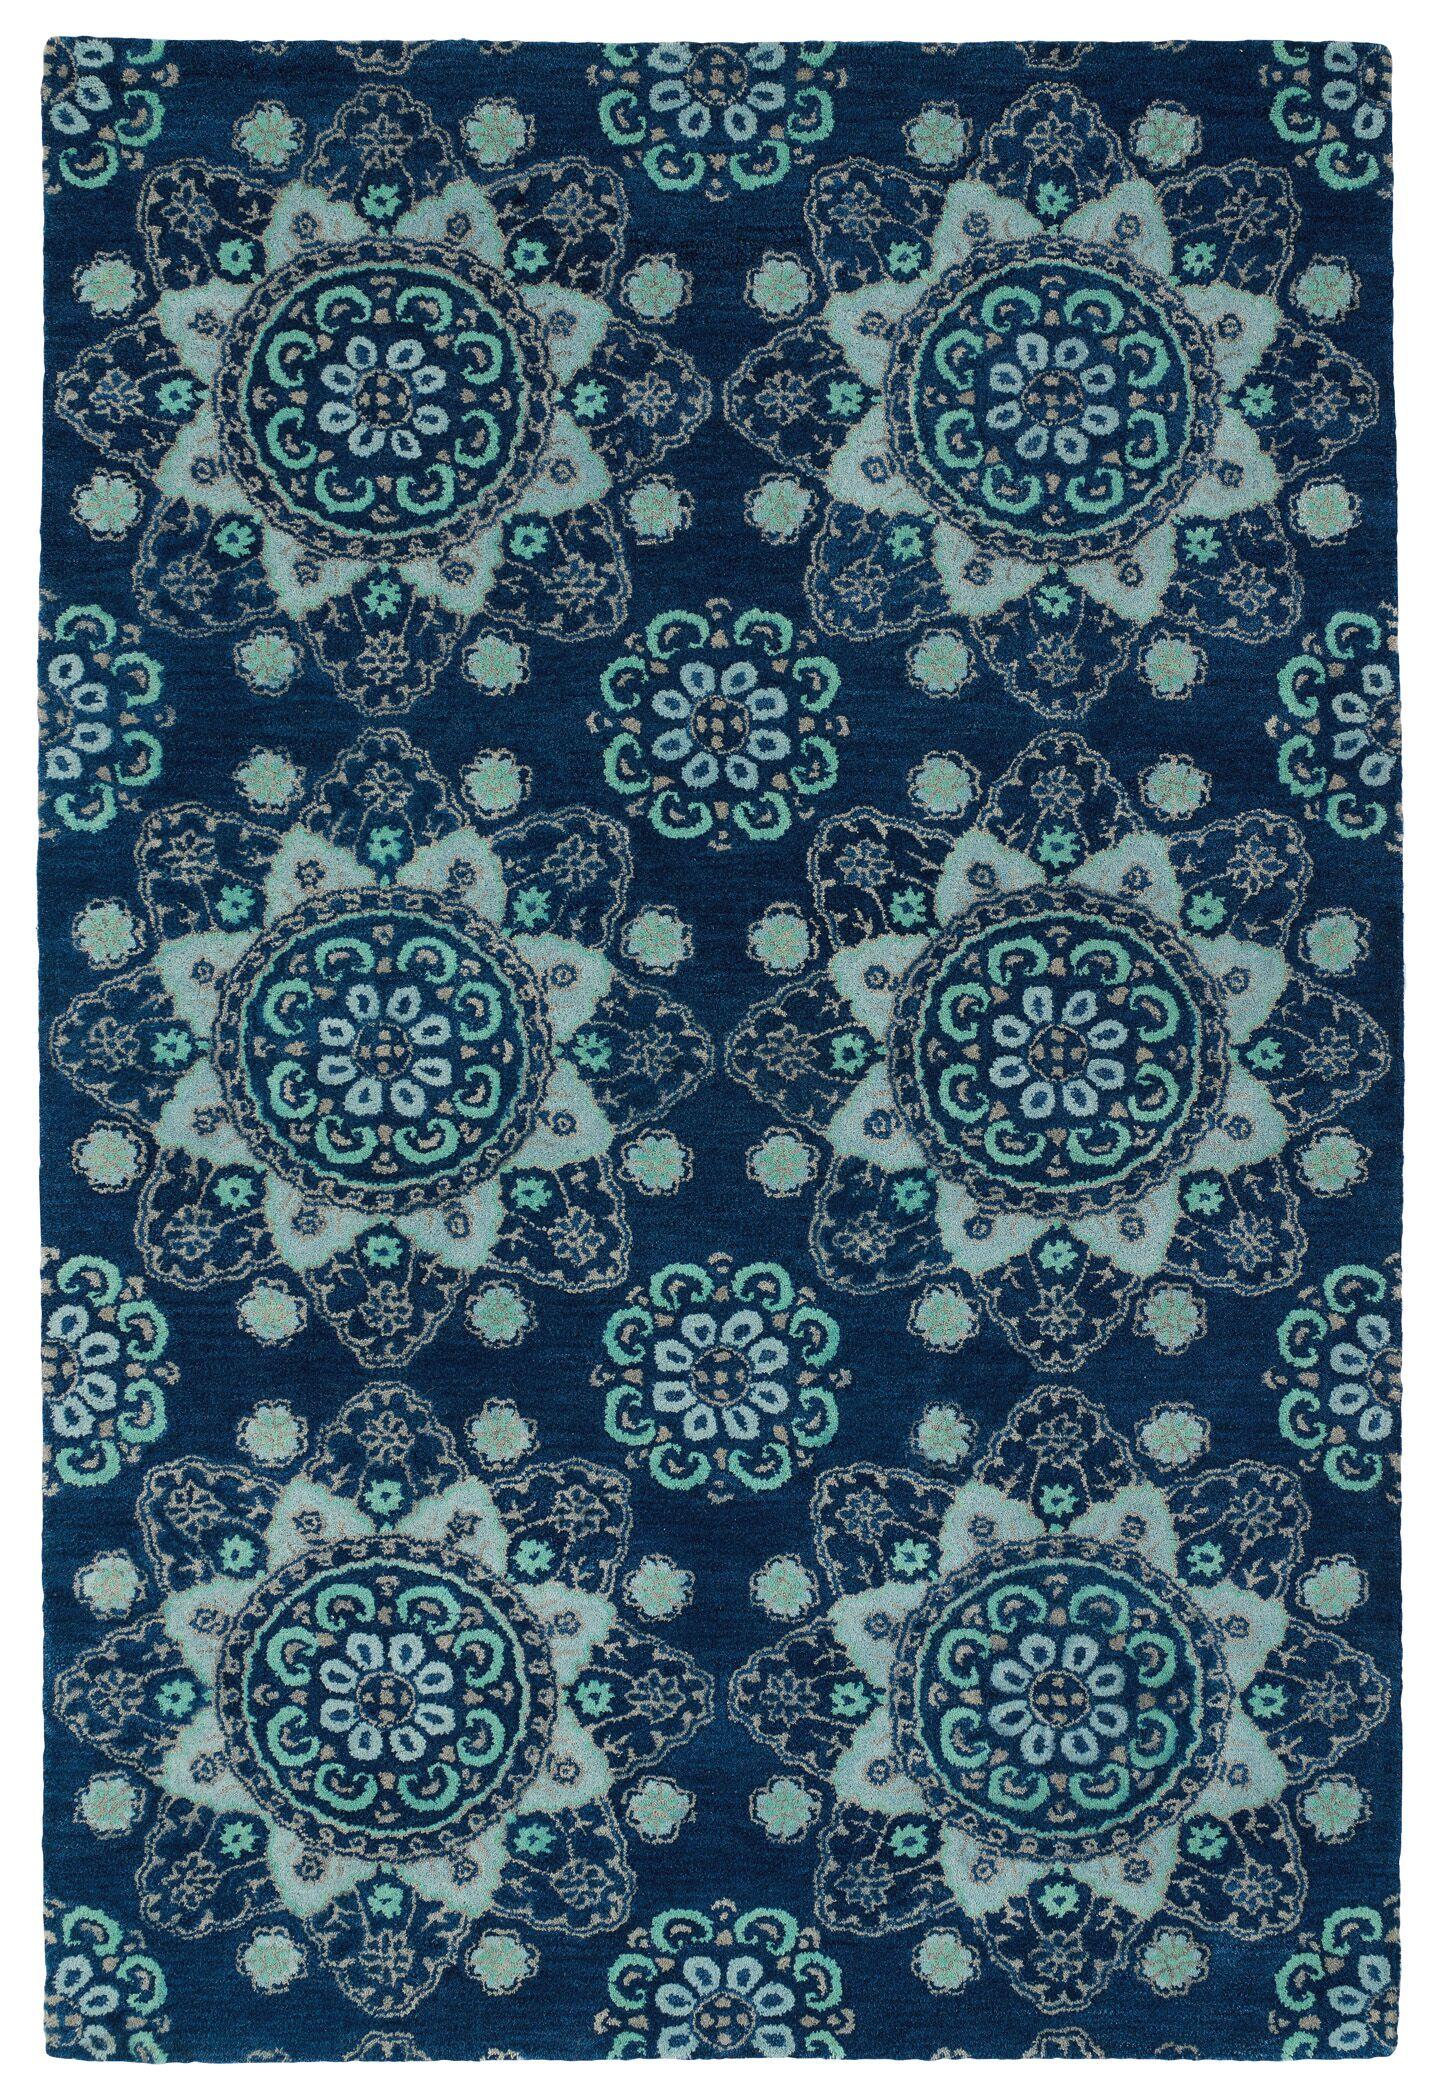 Rachida Hand Tufted Blue Area Rug Rug Size: Rectangle 3'6